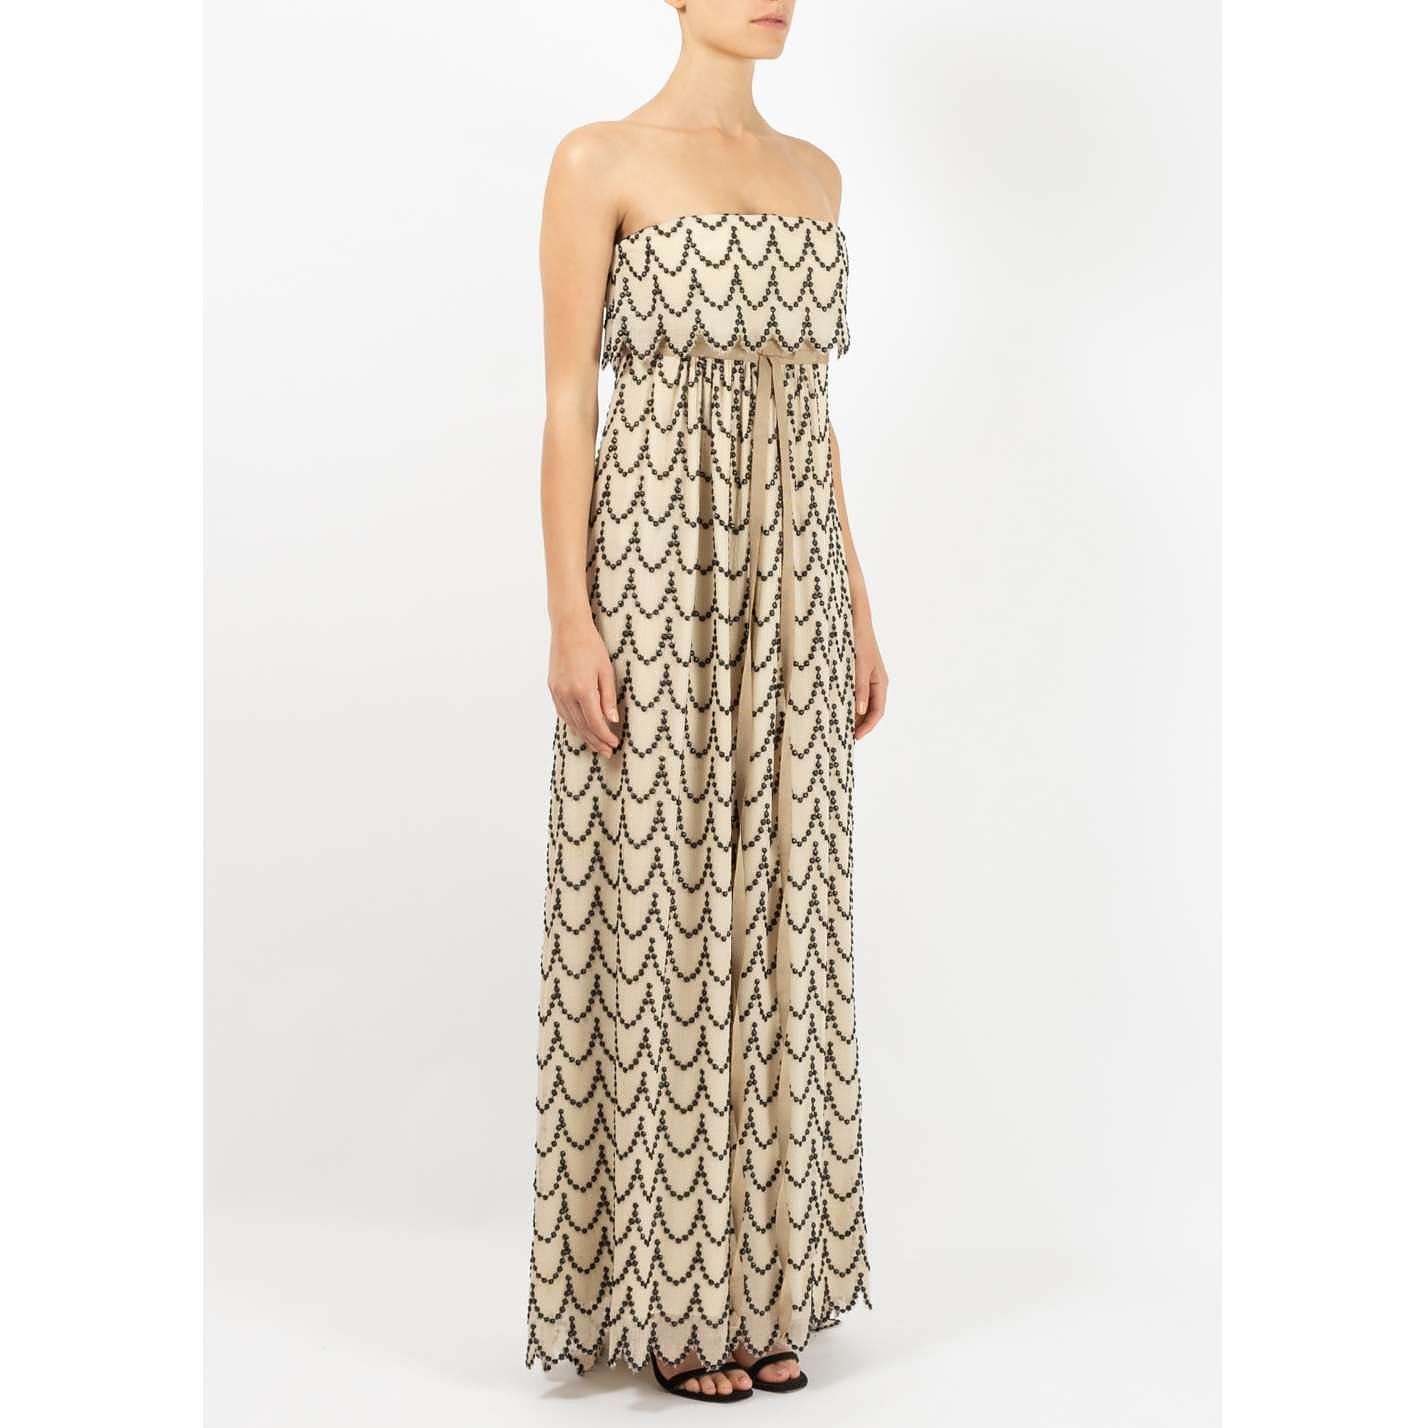 Britt Sisseck Embroidered Strapless Dress